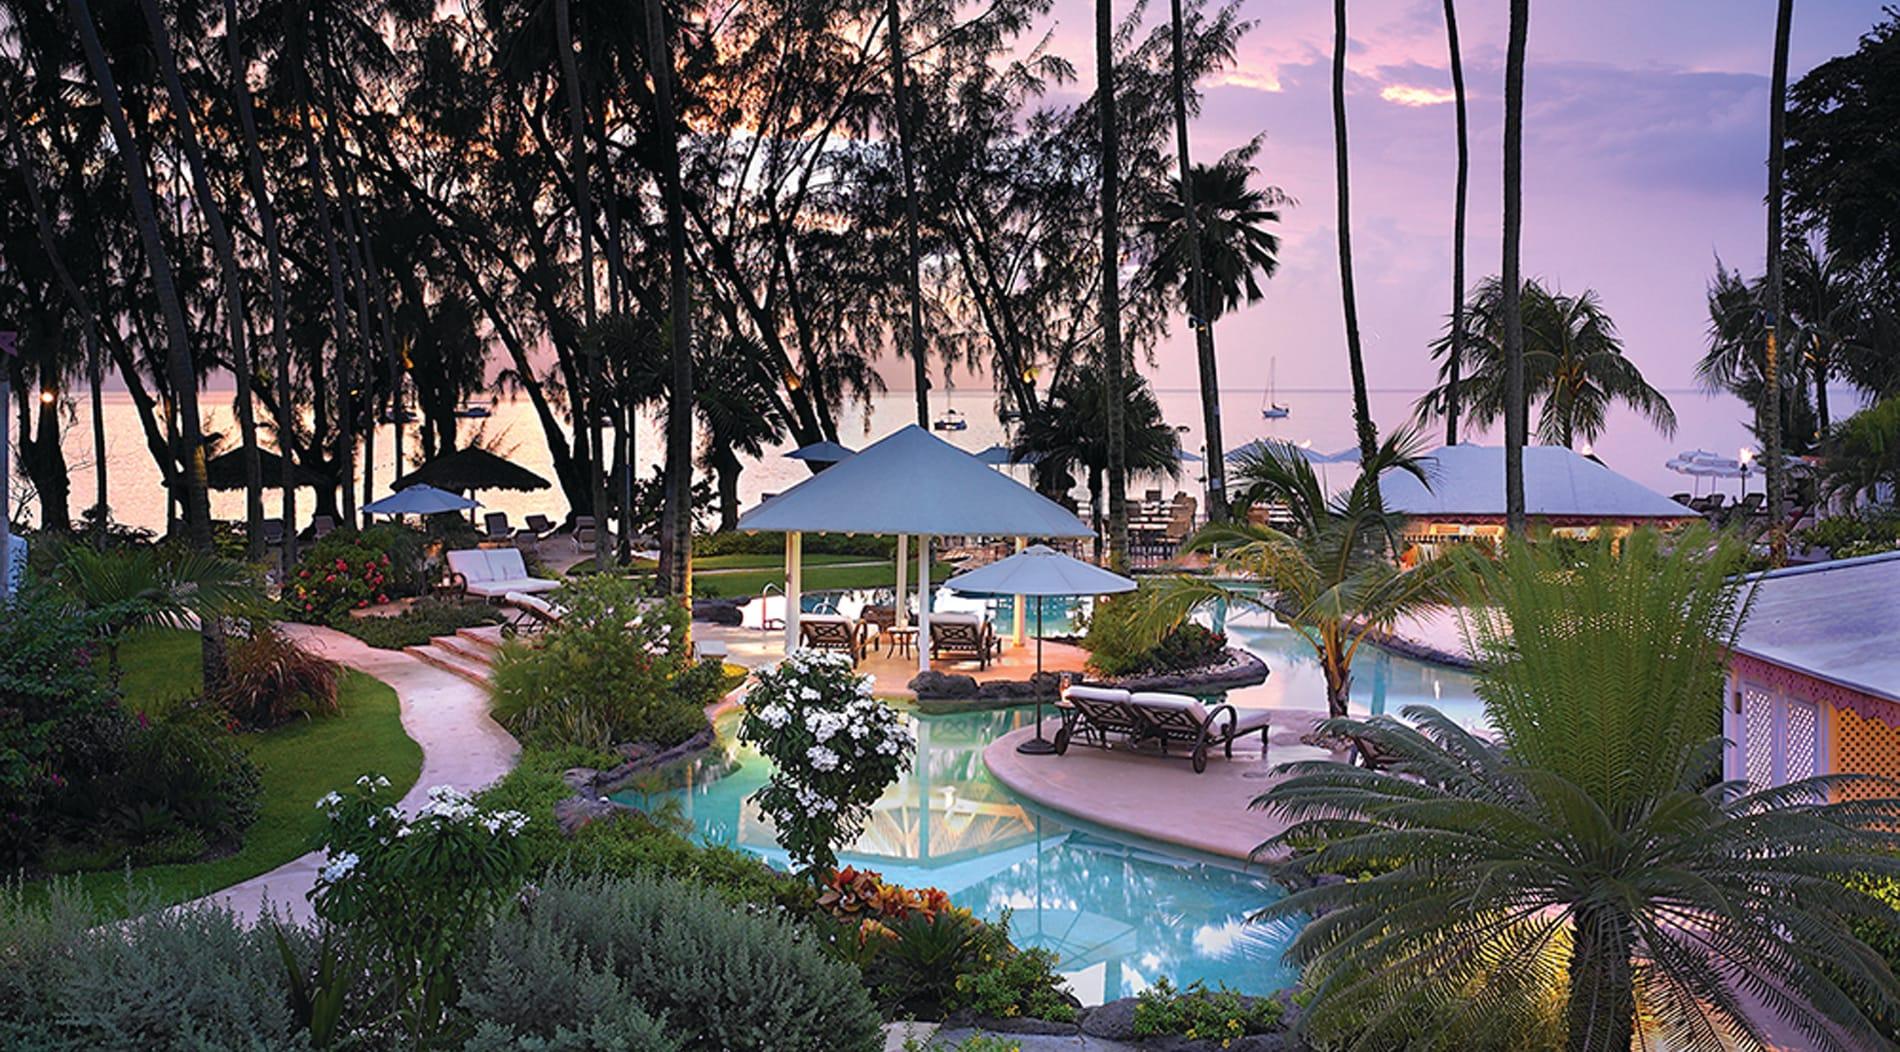 Colony Club gardens, pool, sea and palm trees